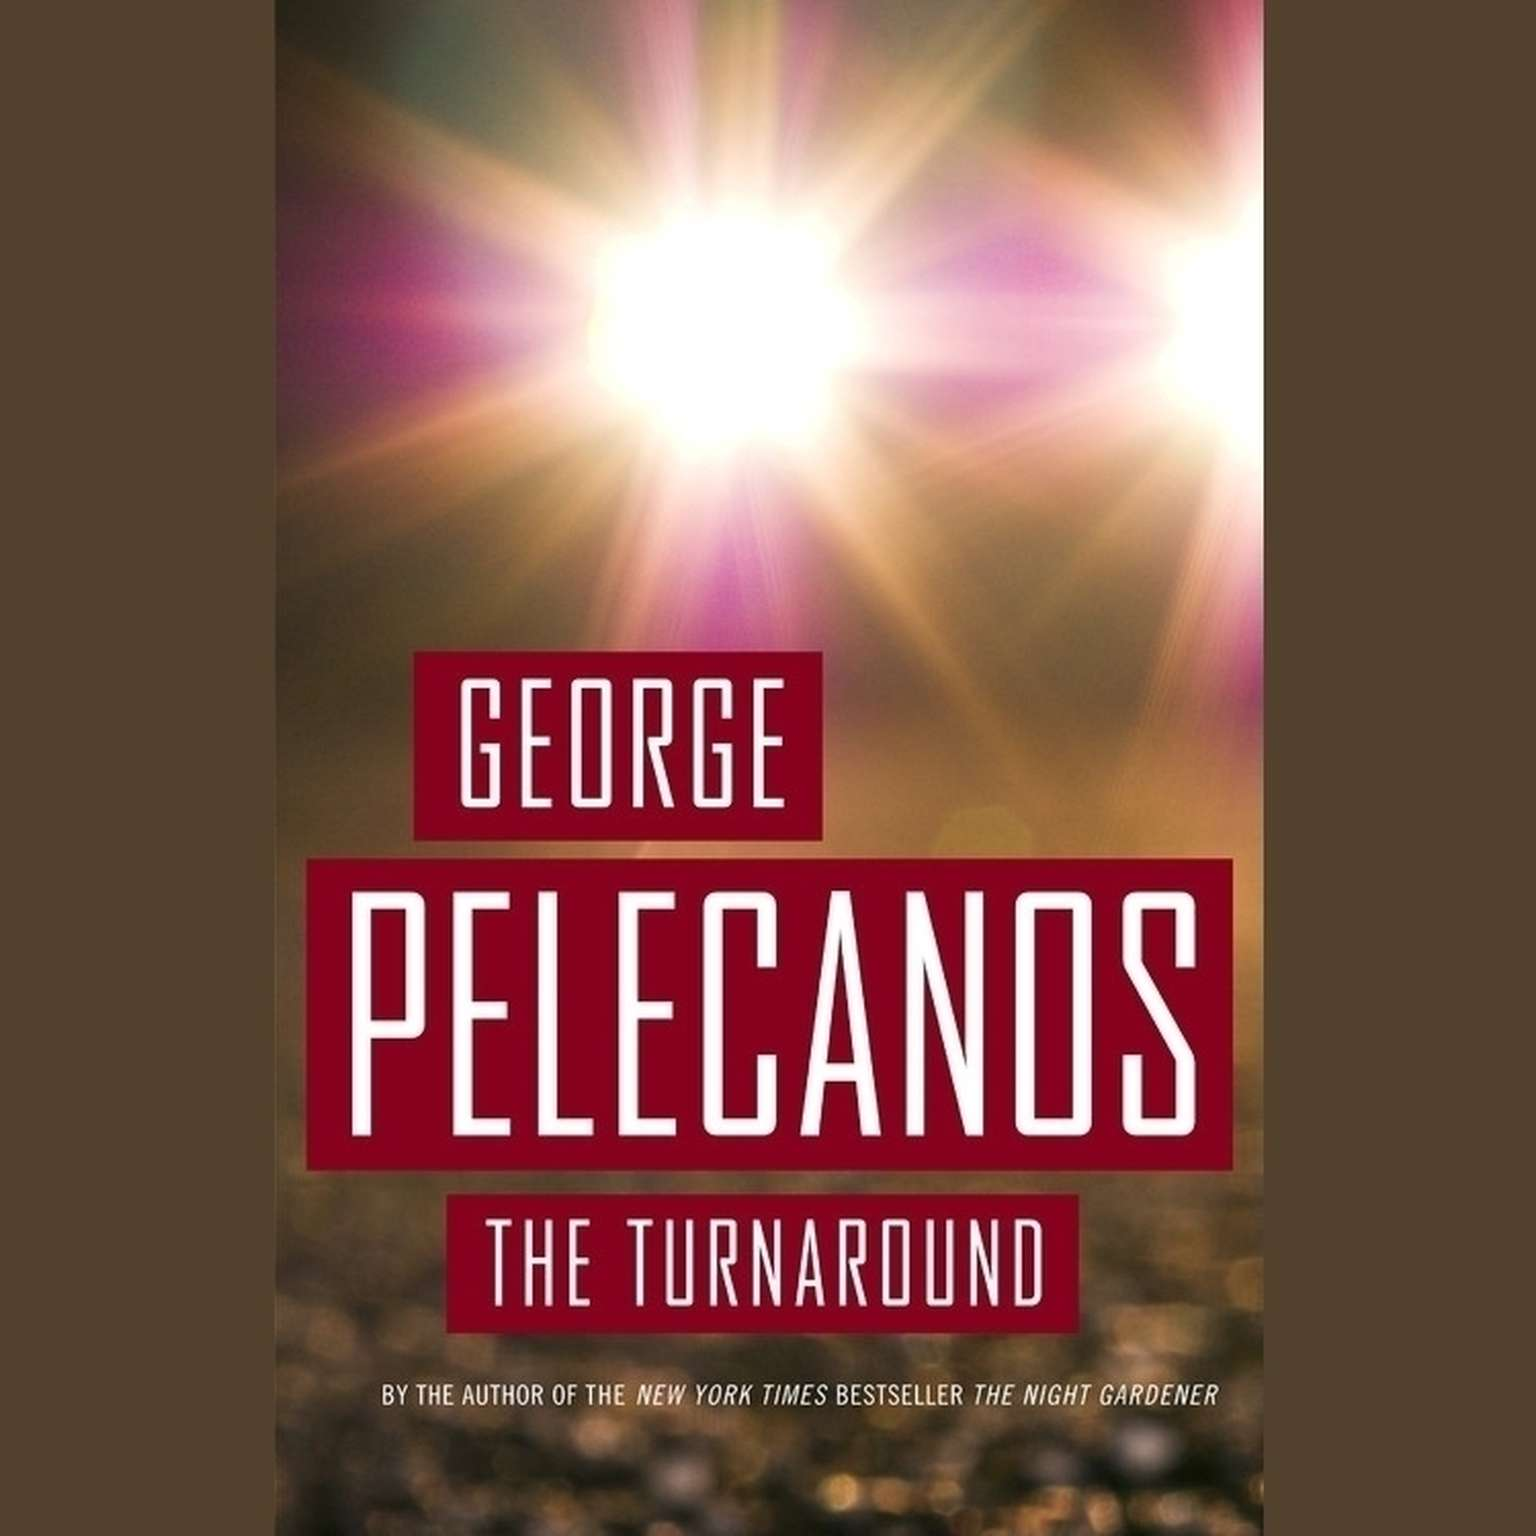 The Turnaround Audiobook